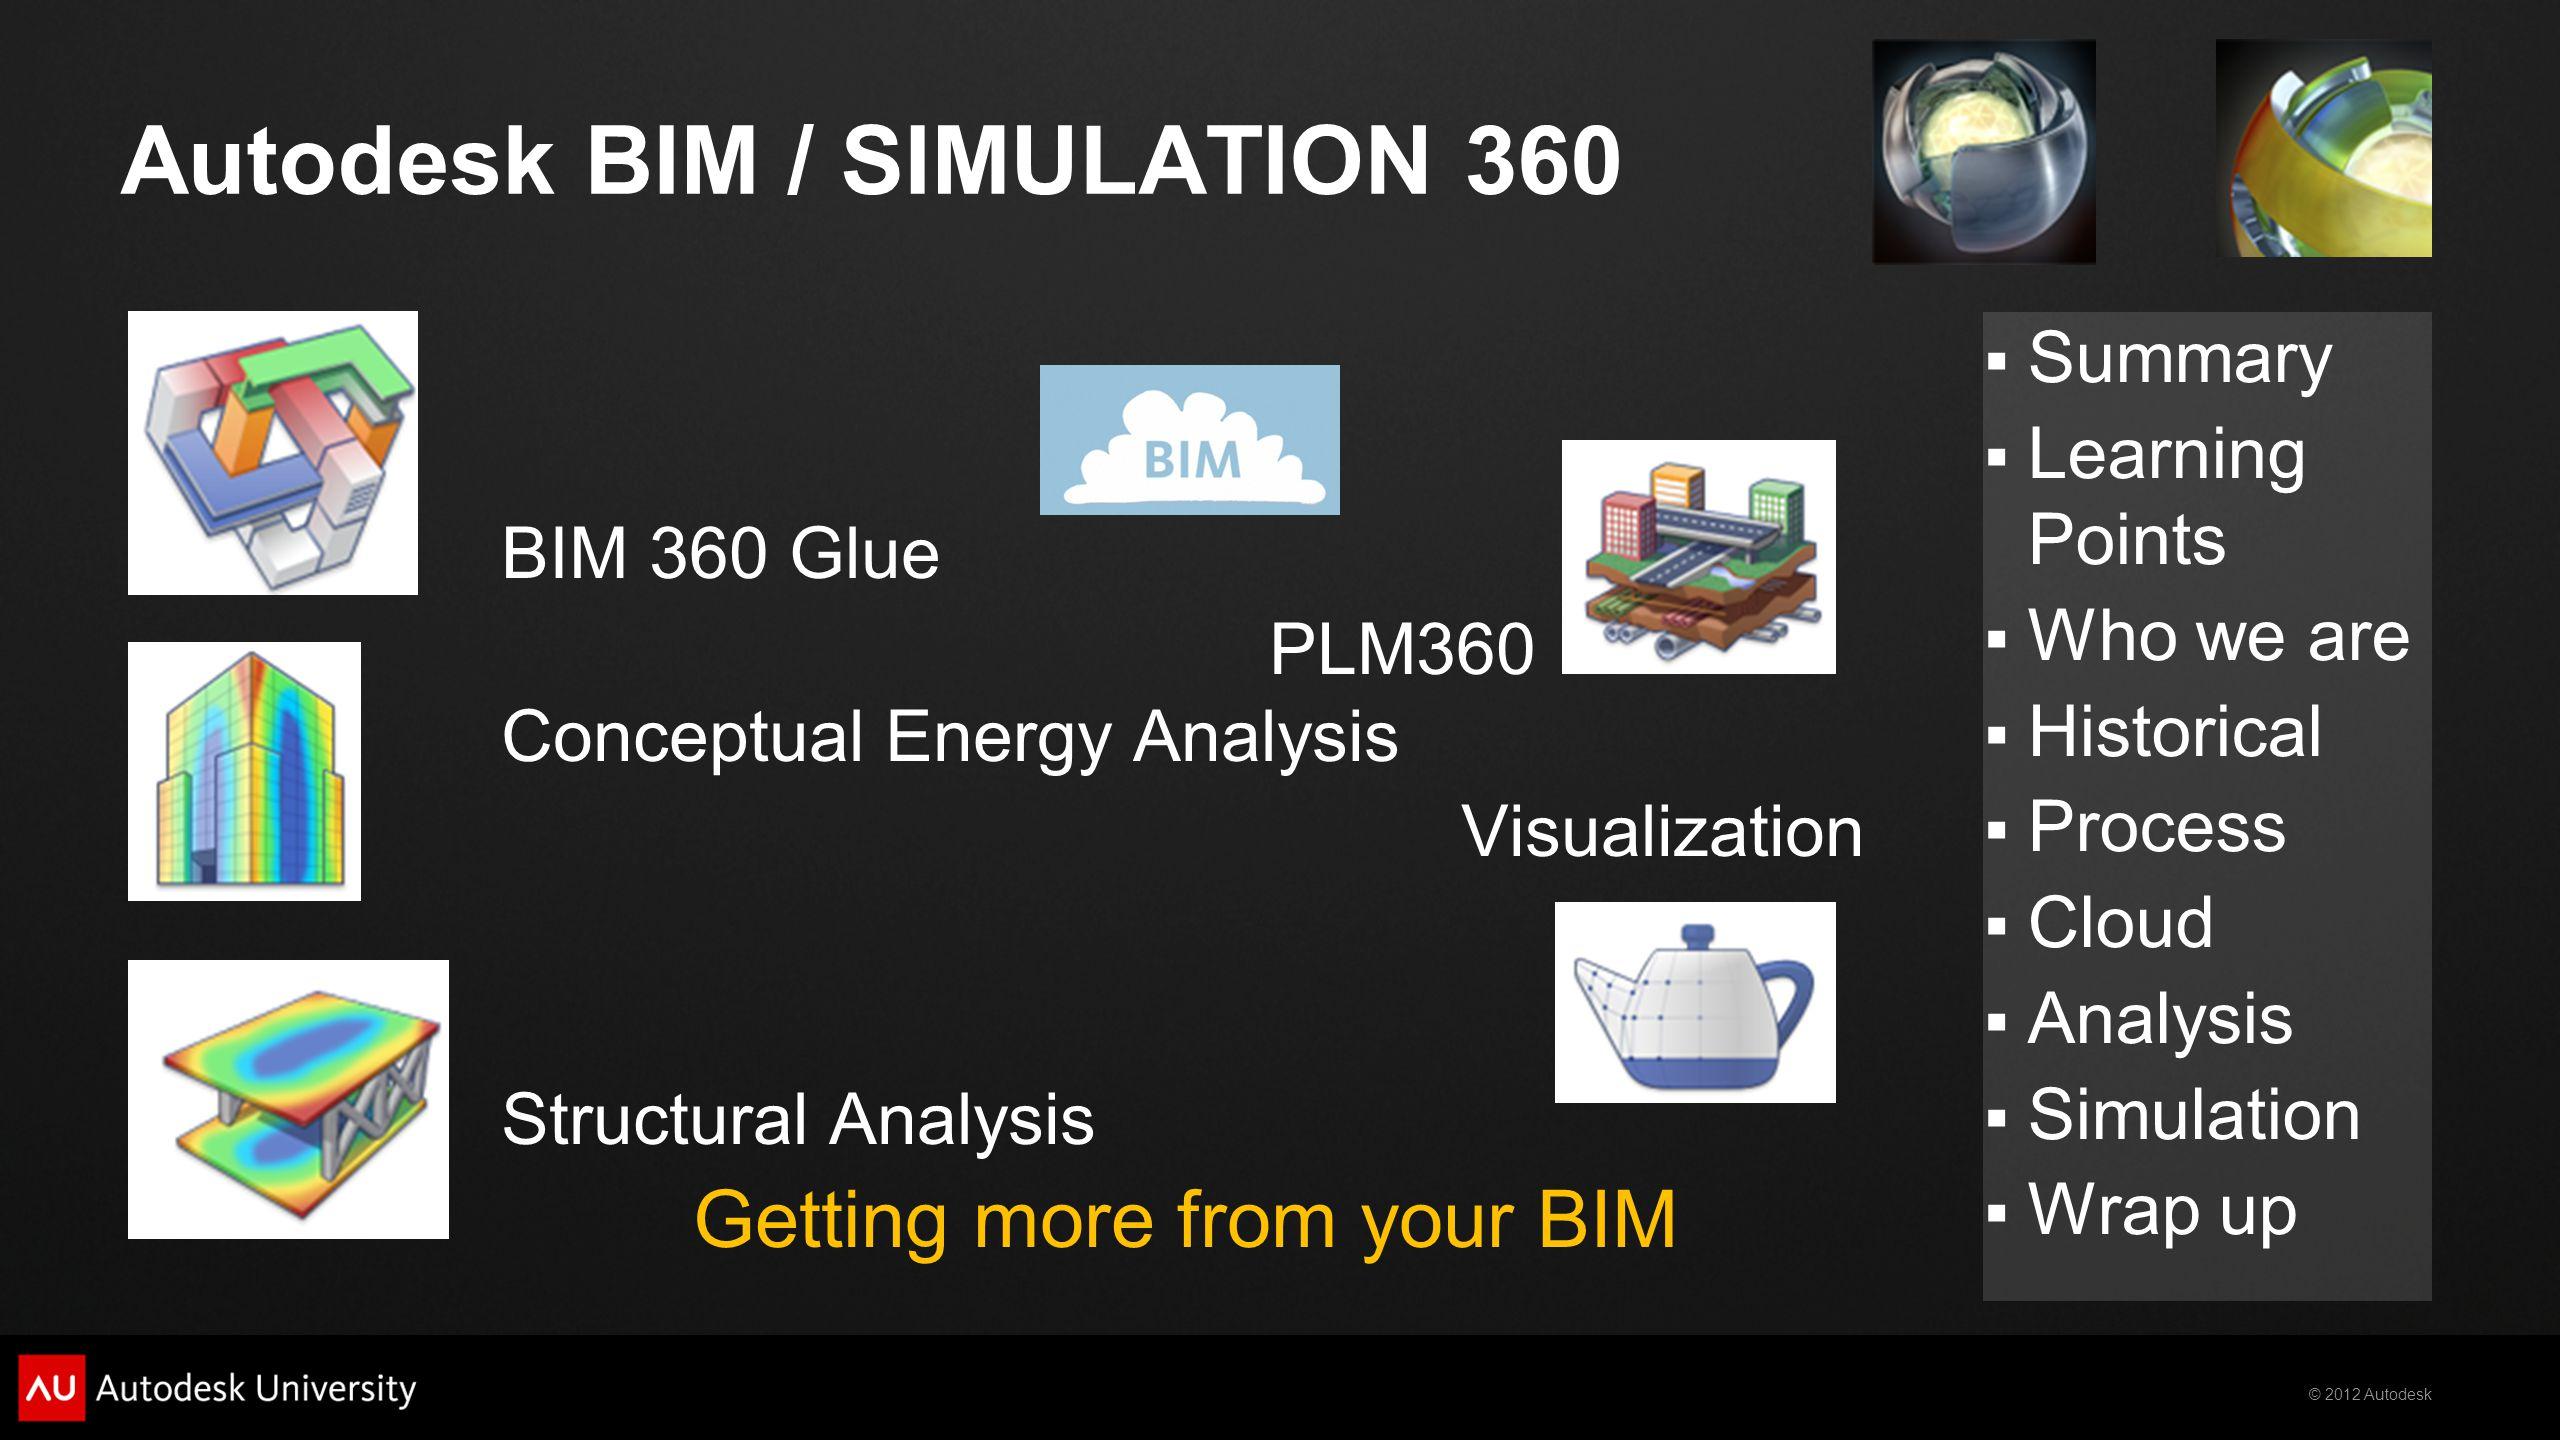 © 2012 Autodesk  Summary  Learning Points  Who we are  Historical  Process  Cloud  Analysis  Simulation  Wrap up Autodesk BIM / SIMULATION 36